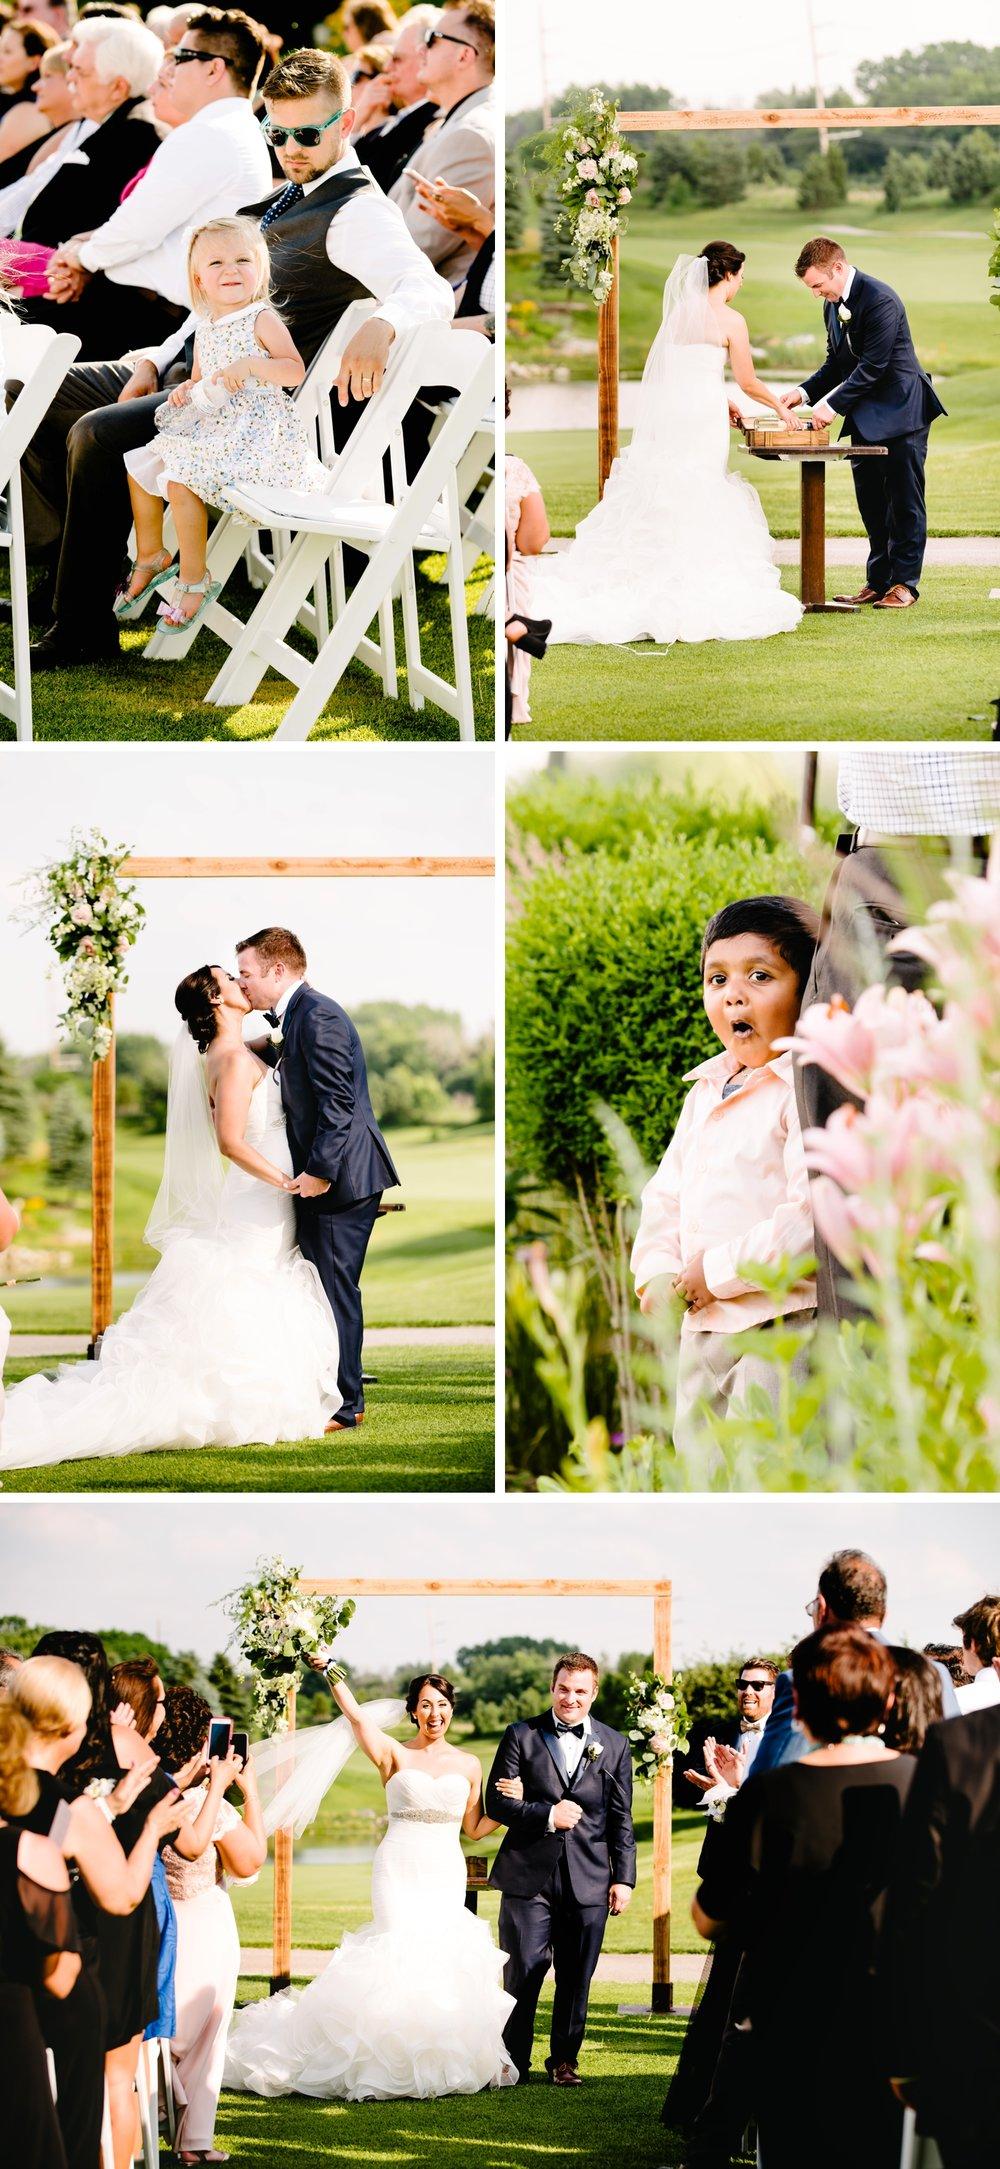 chicago-fine-art-wedding-photography-burdi5